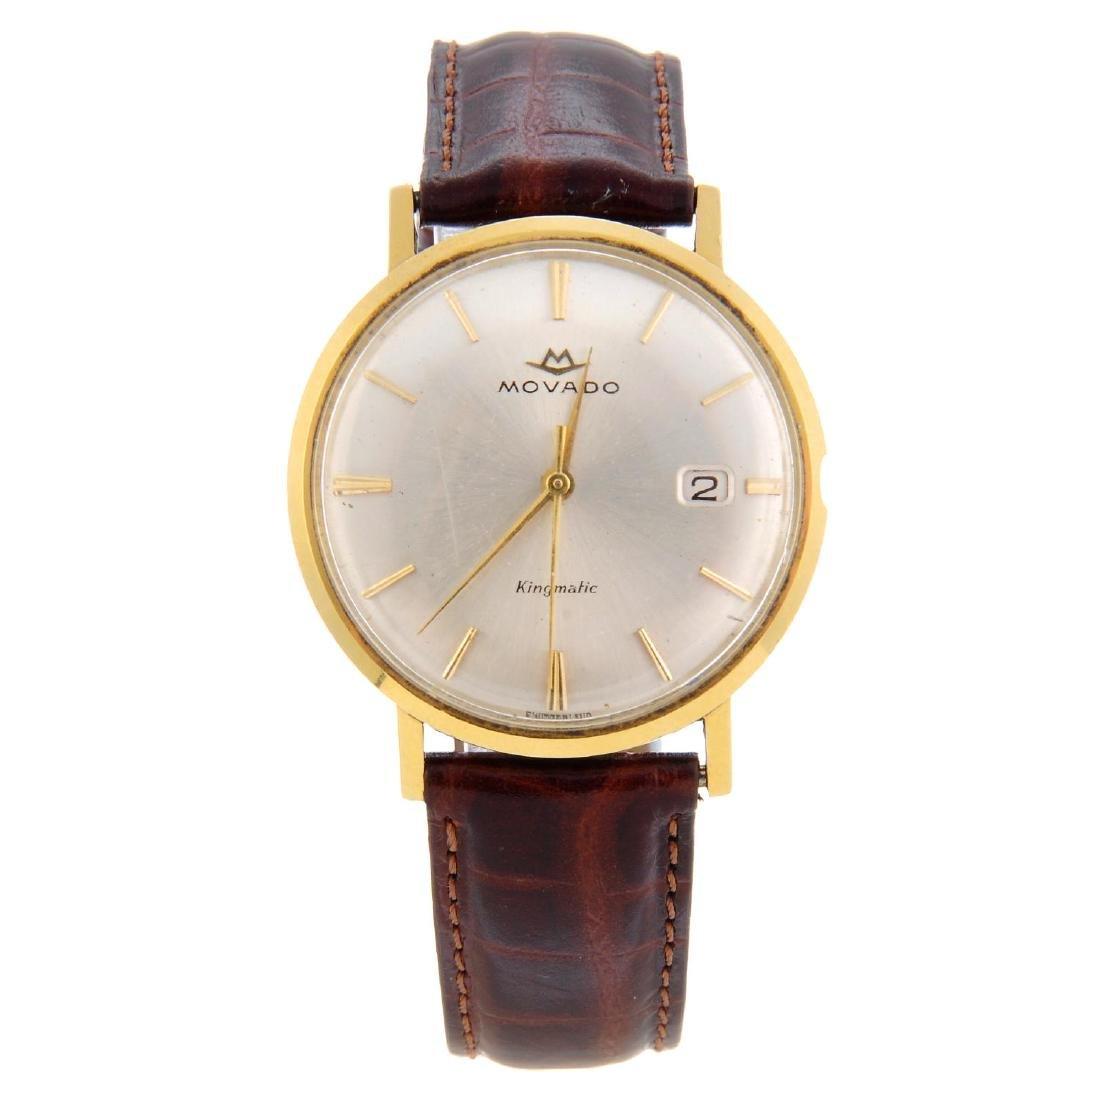 MOVADO - a gentleman's Kingmatic wrist watch. Yellow